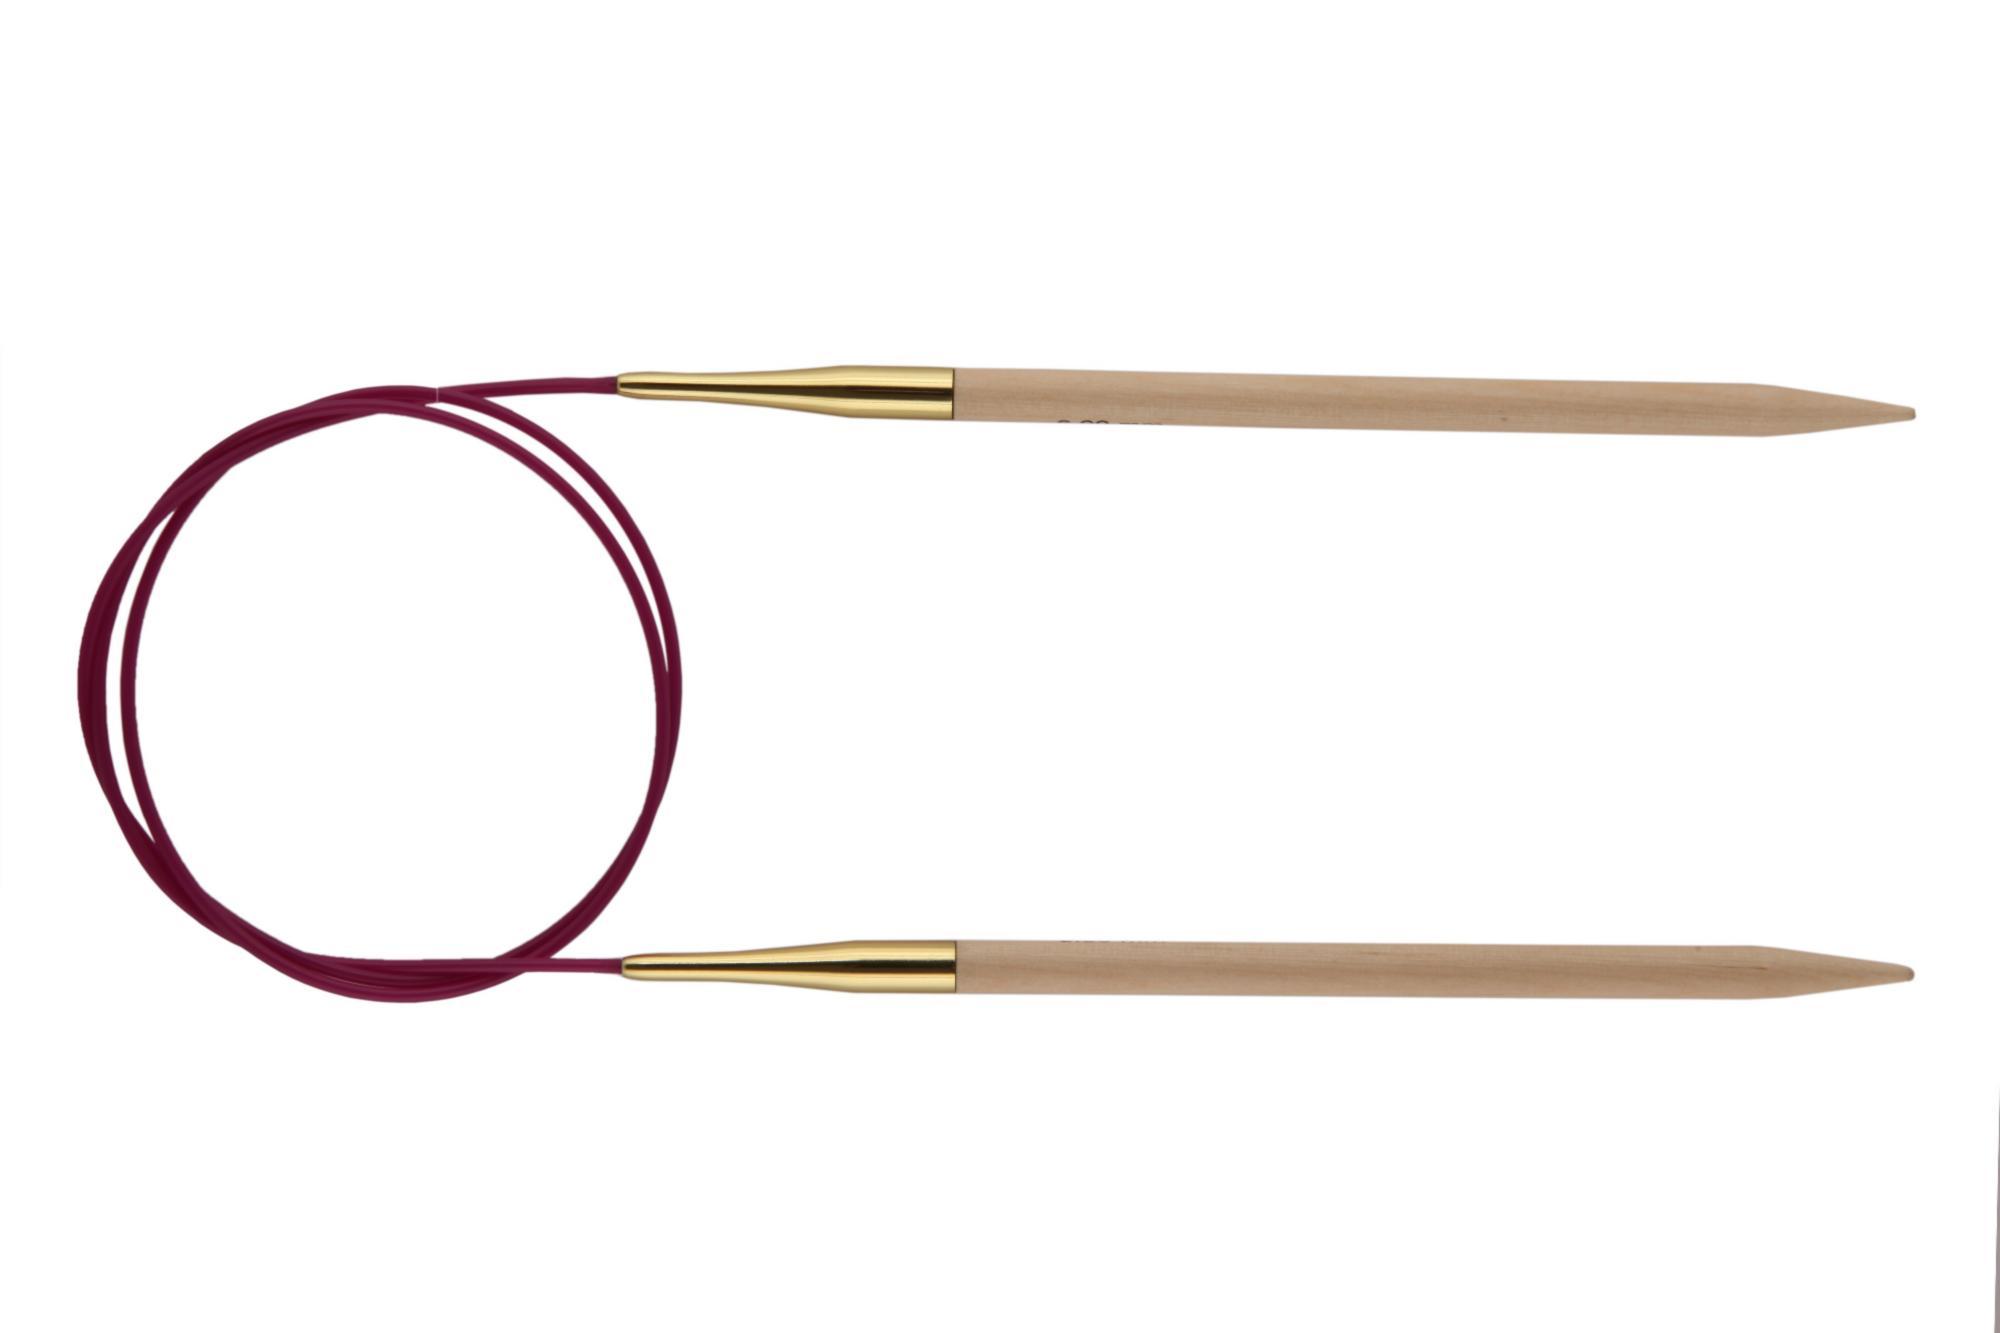 Спицы круговые 60 см Basix Birch Wood KnitPro, 35605, 3.00 мм